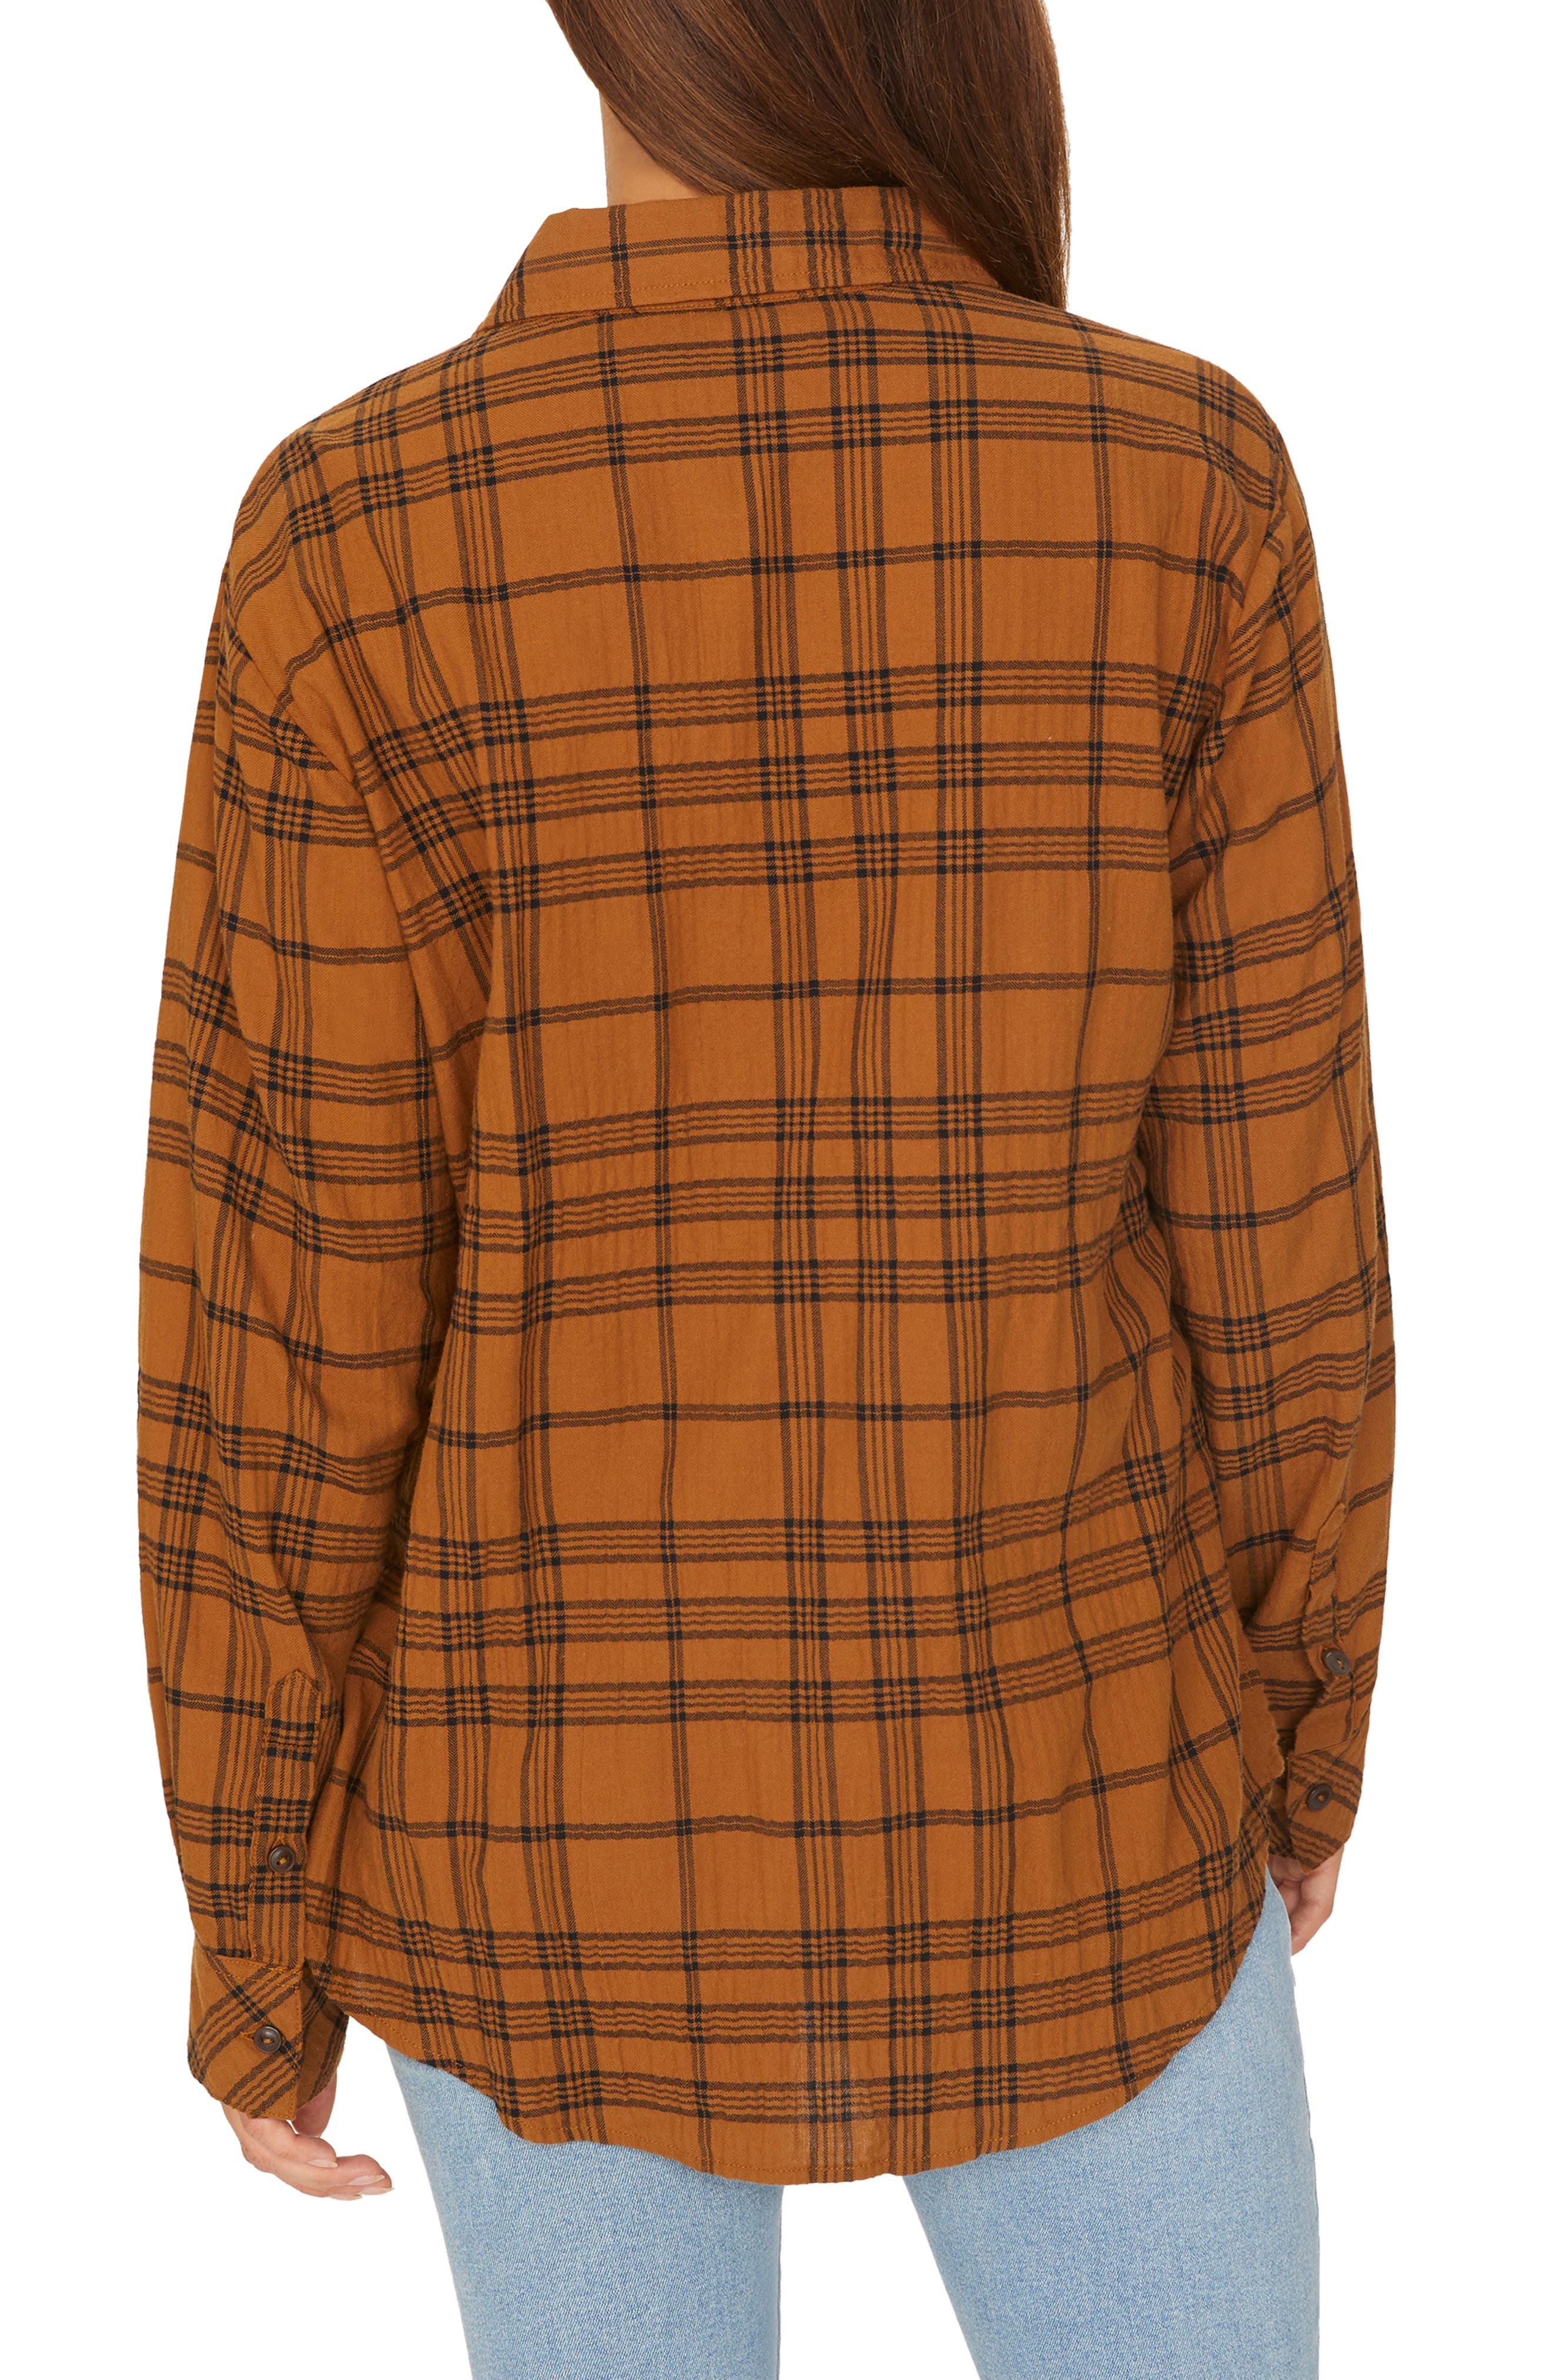 Boyfriend for Life Plaid Shirt,                             Alternate thumbnail 2, color,                             AUTUMN PLAID